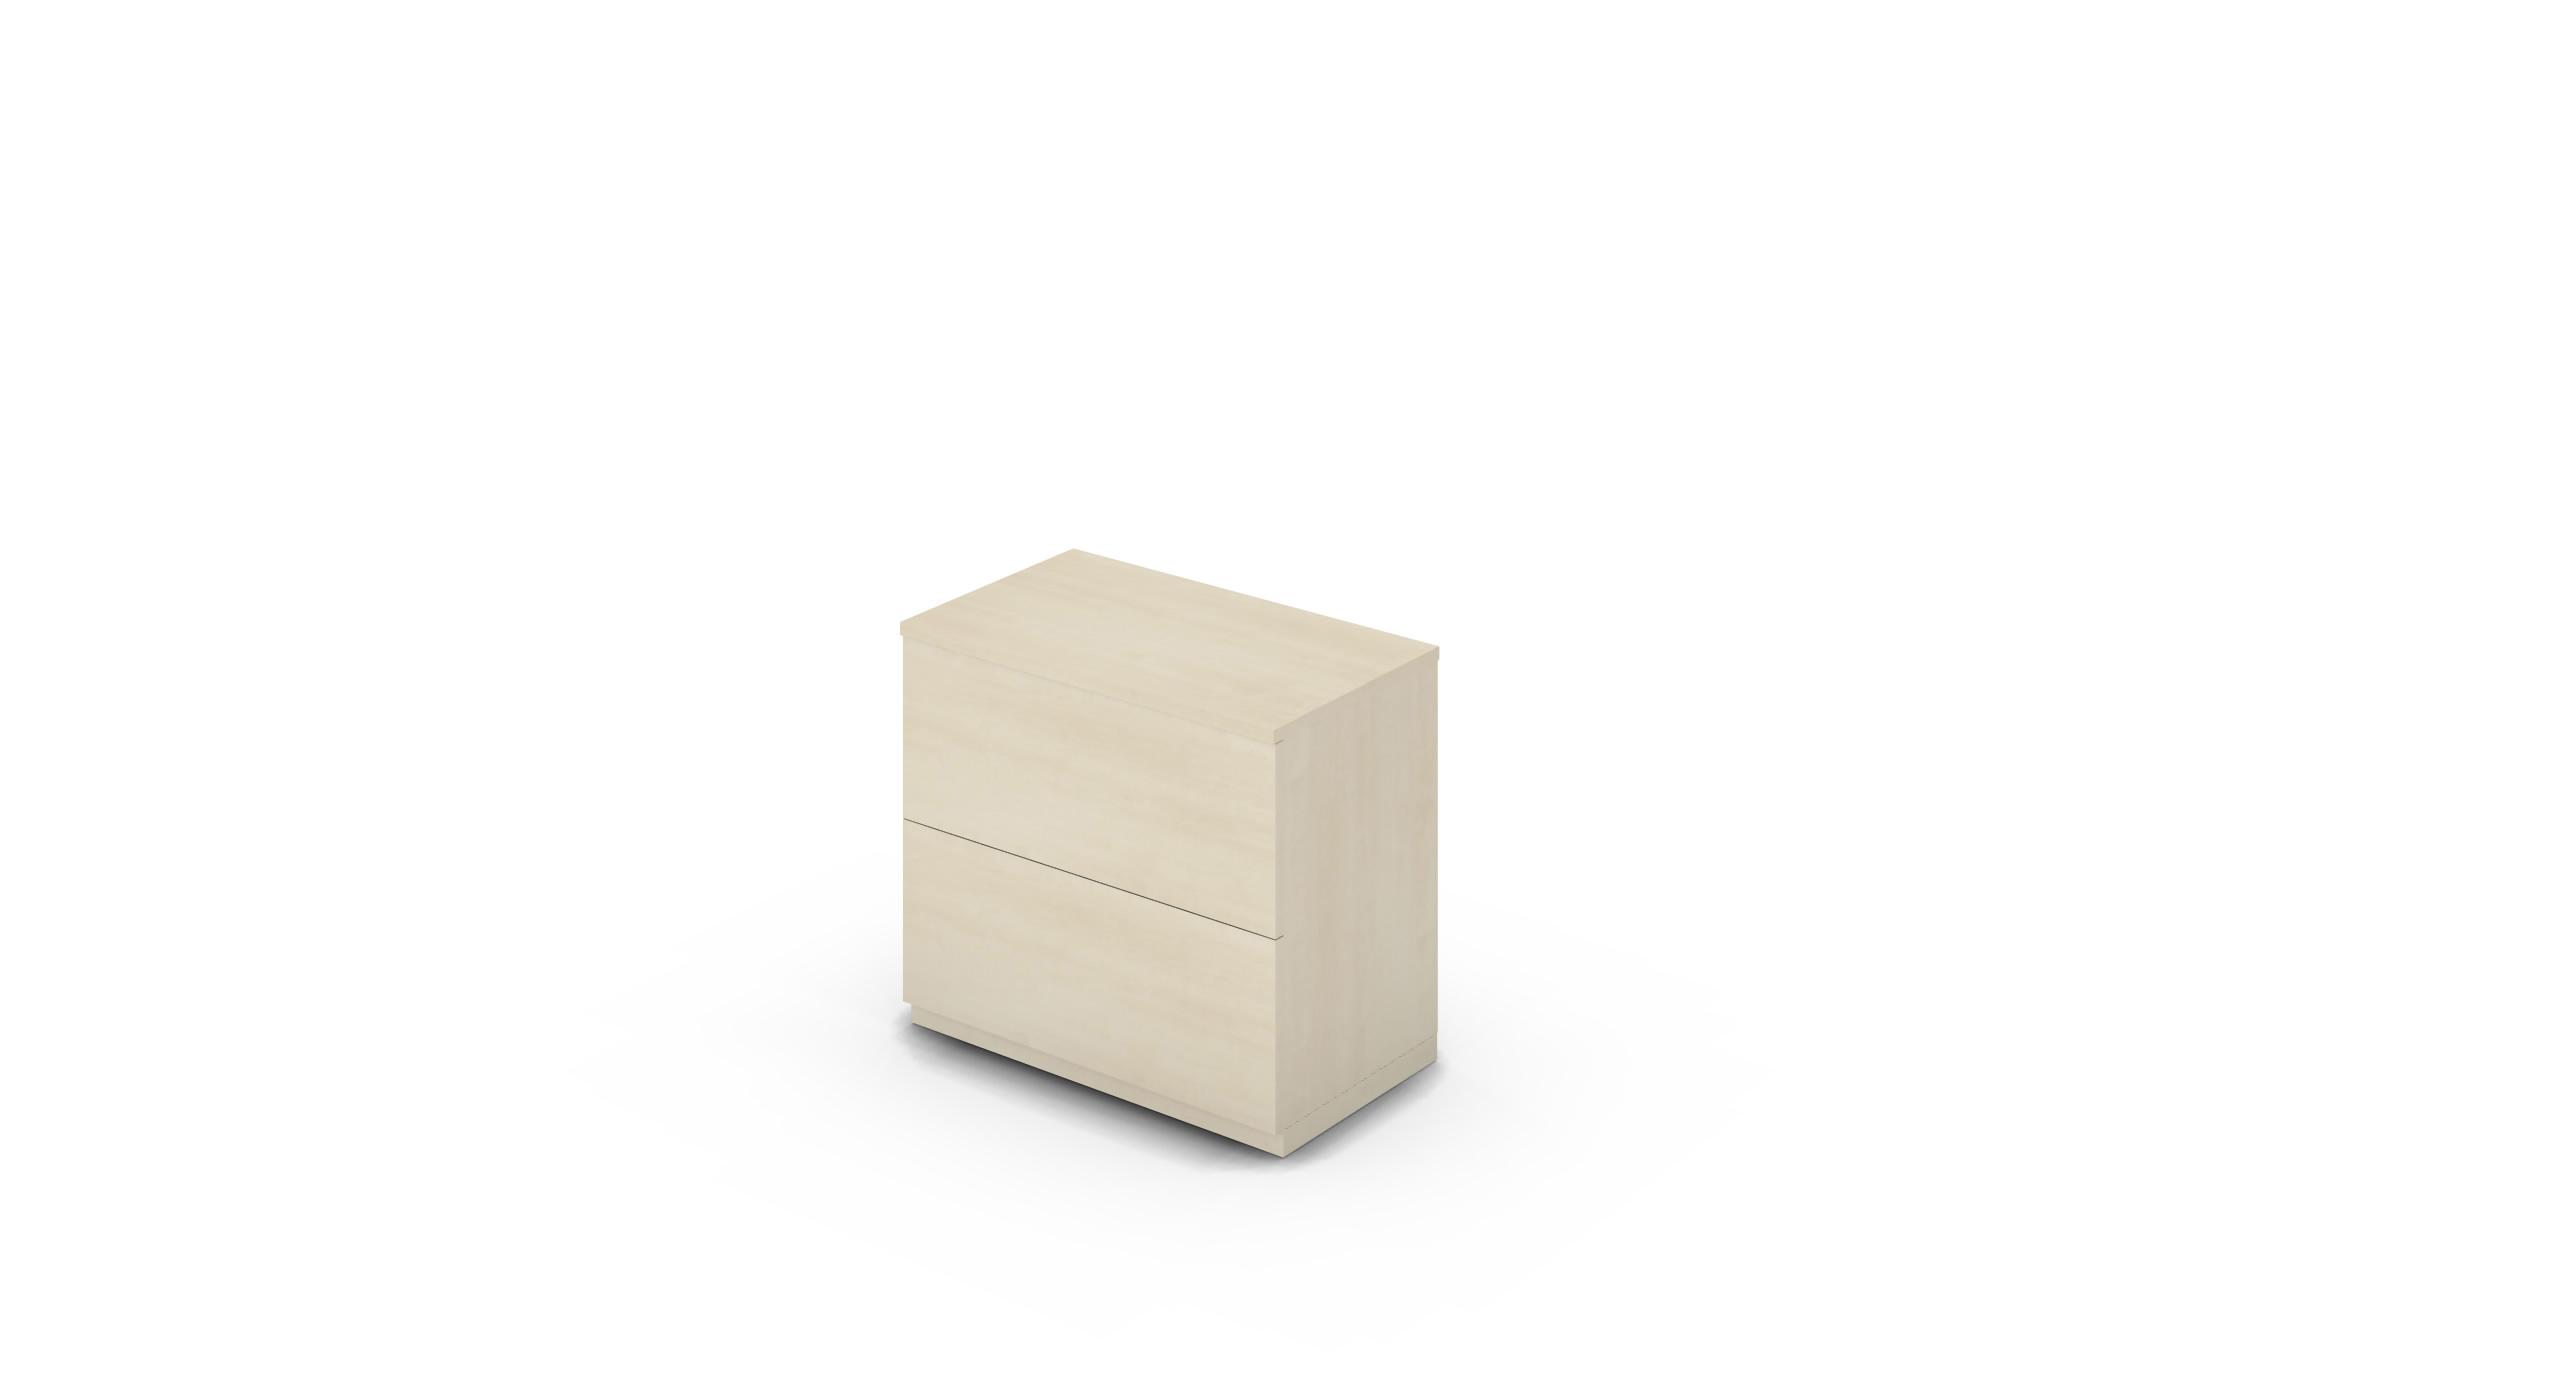 Cabinet_800x450x775_DR_Maple_Push_NoCylinder